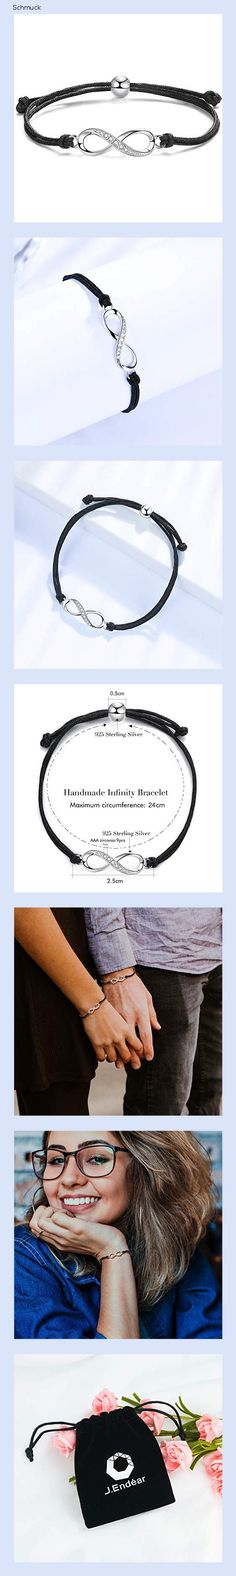 J.Endéar Armband Damen Unendlichkeitszeichen Silber 925 Seil Armband handgemachte Freundschaft Armband Liebesgeschenke 24cm verstellbar - 14hd